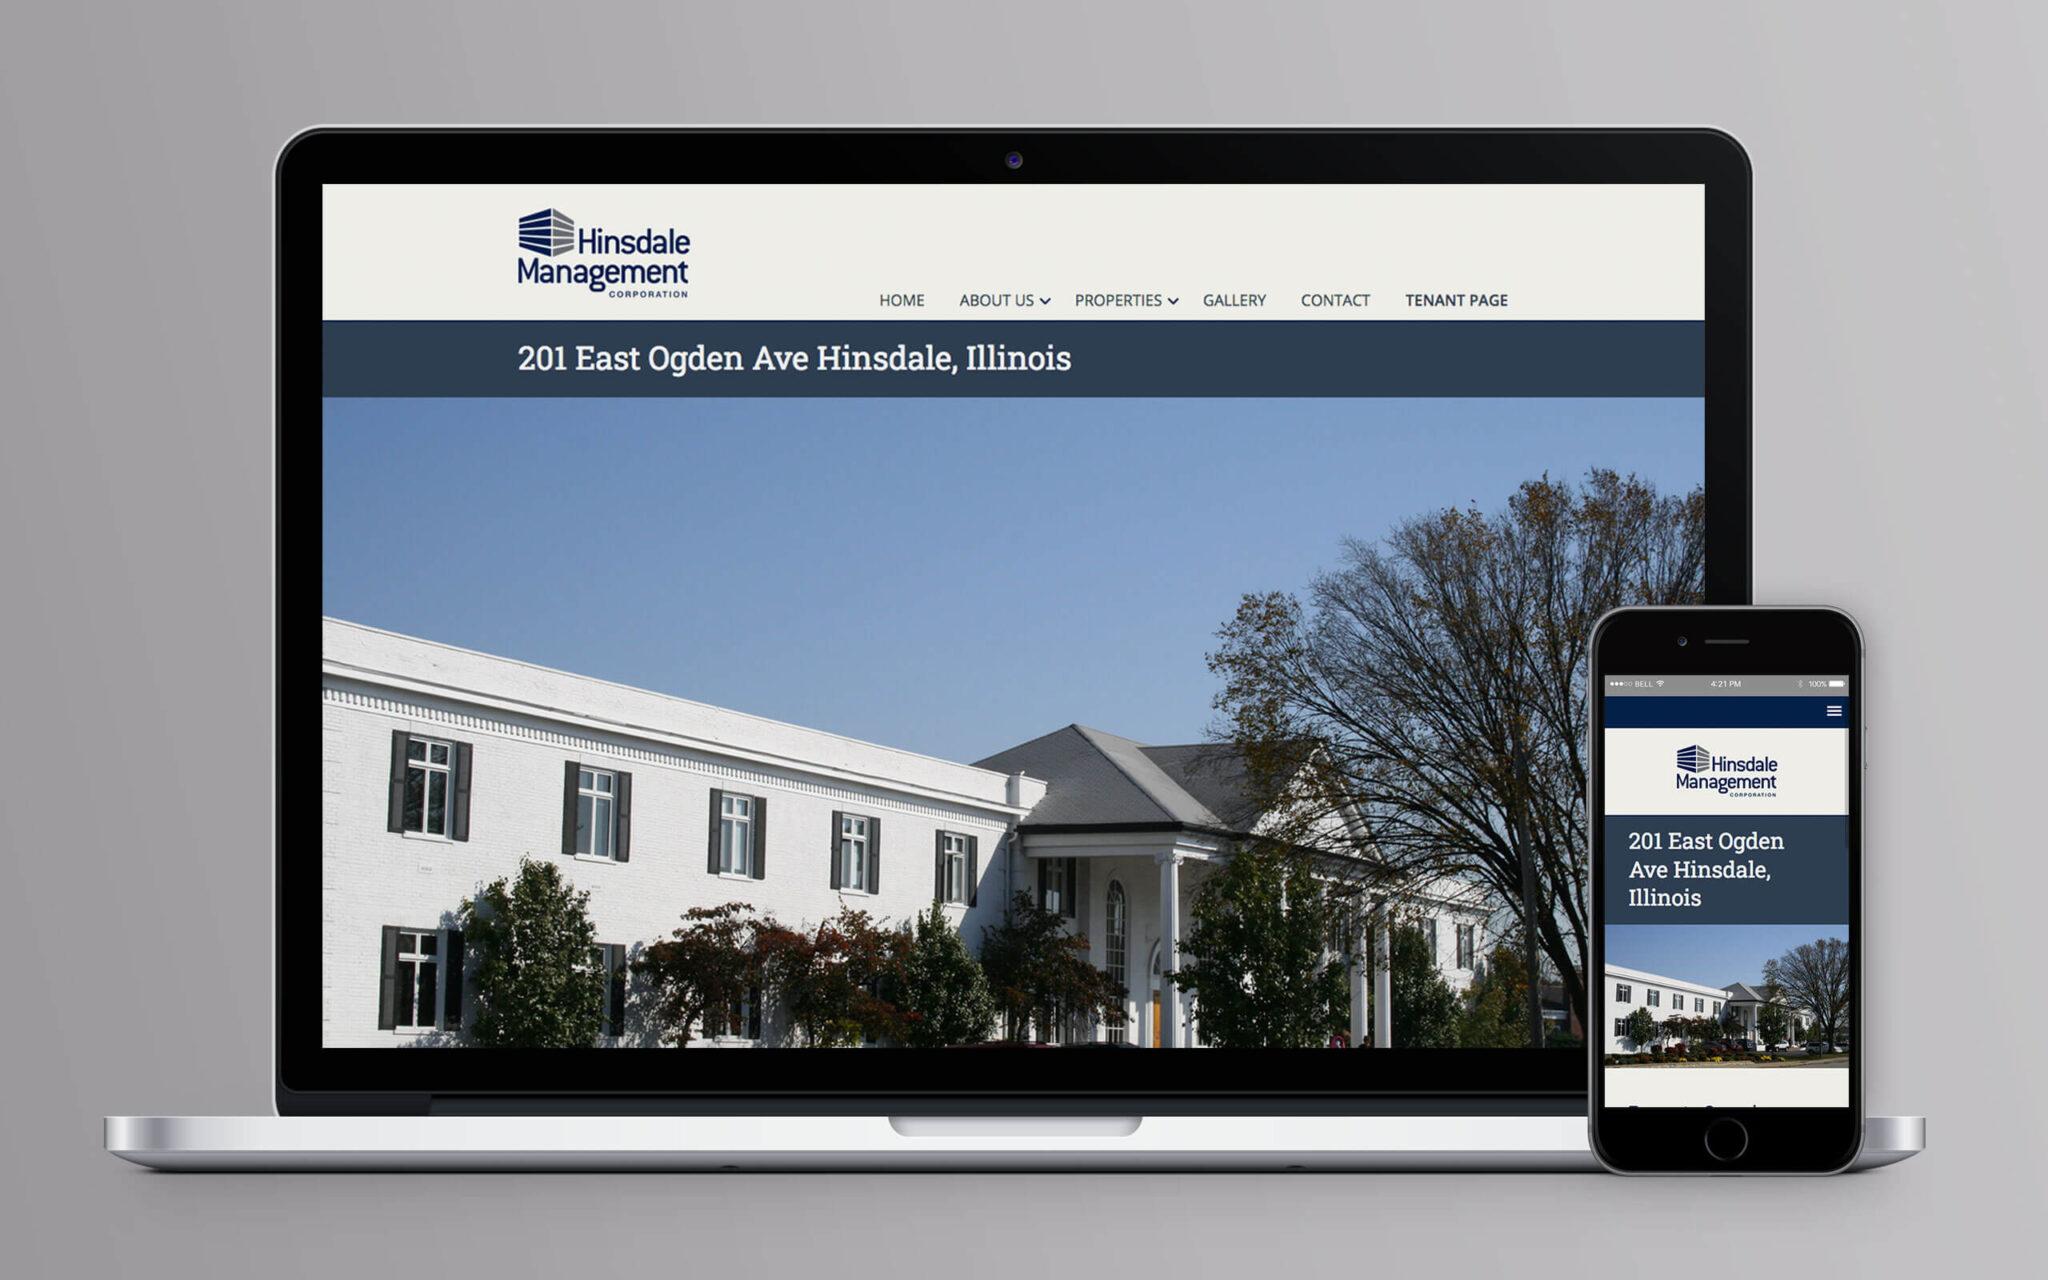 Hinsdale Management Corporation Website Properties